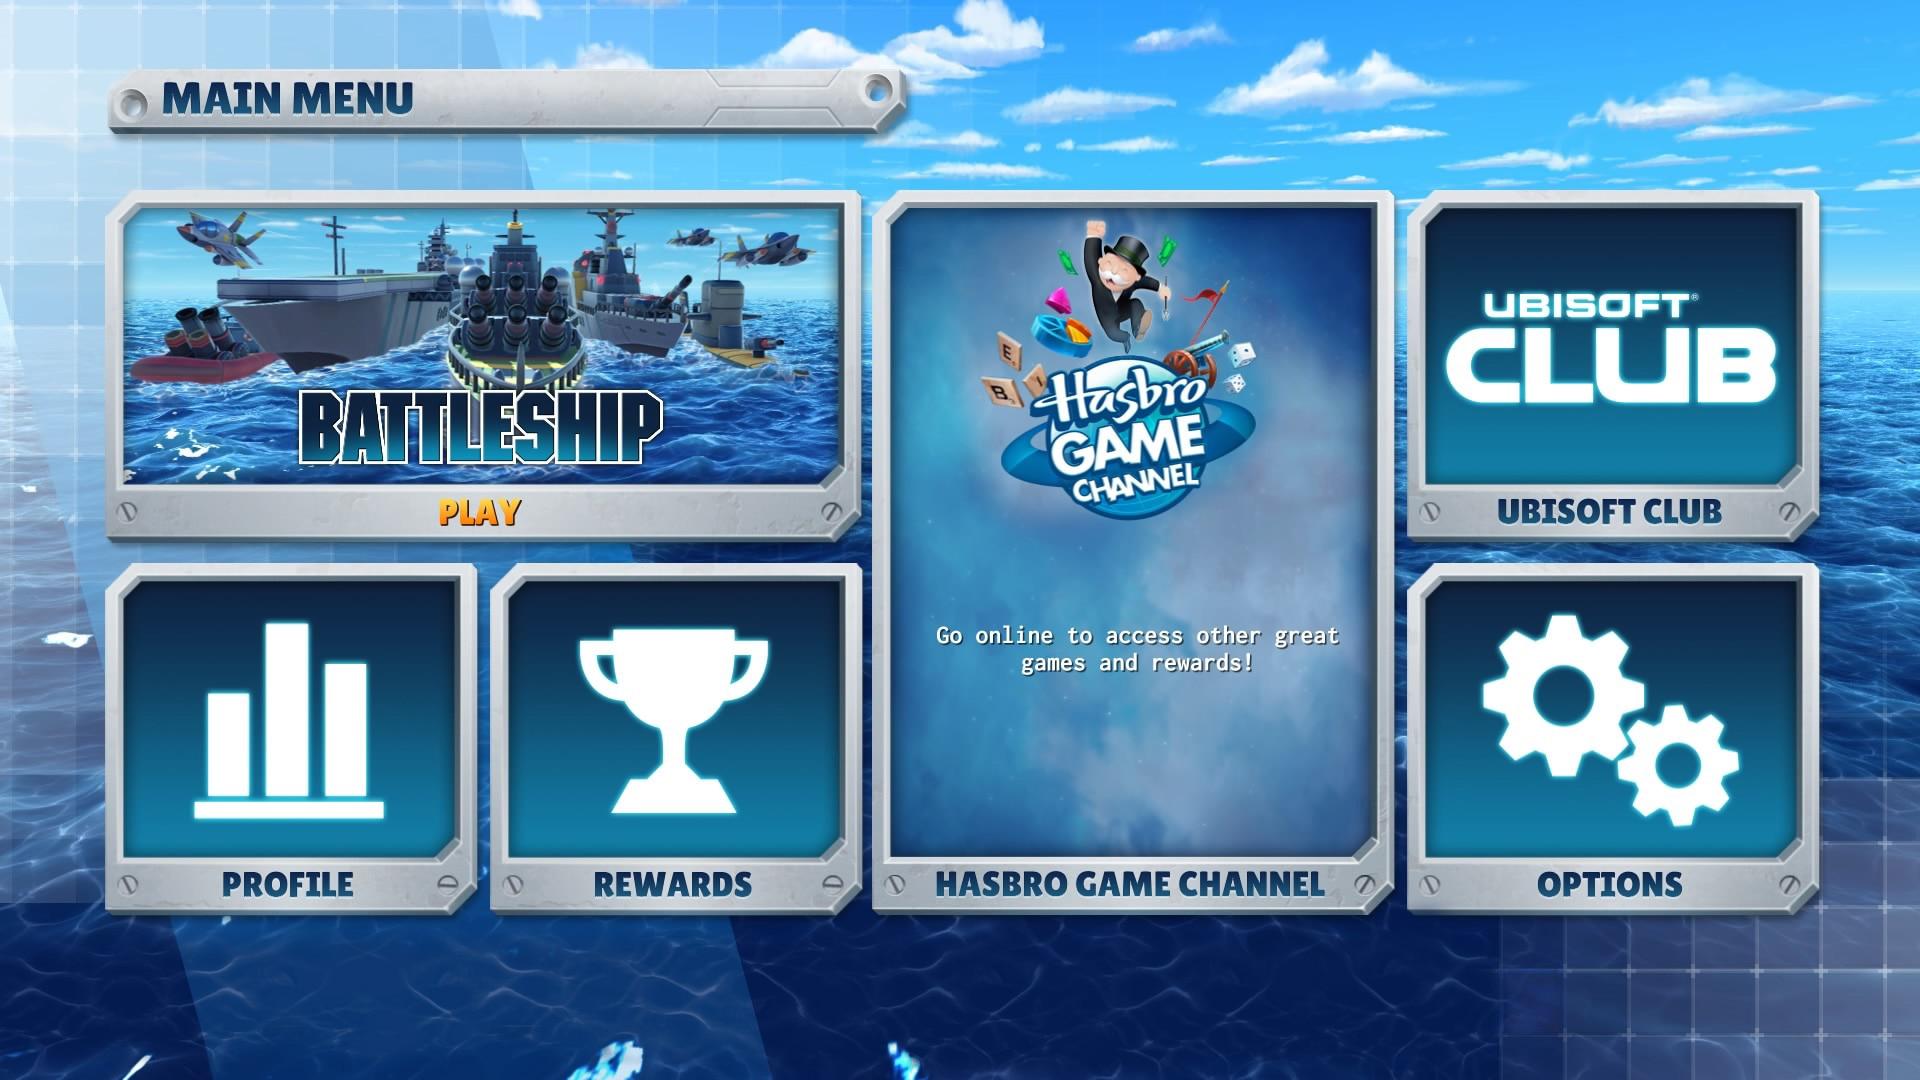 Battleship Ubisoft Us